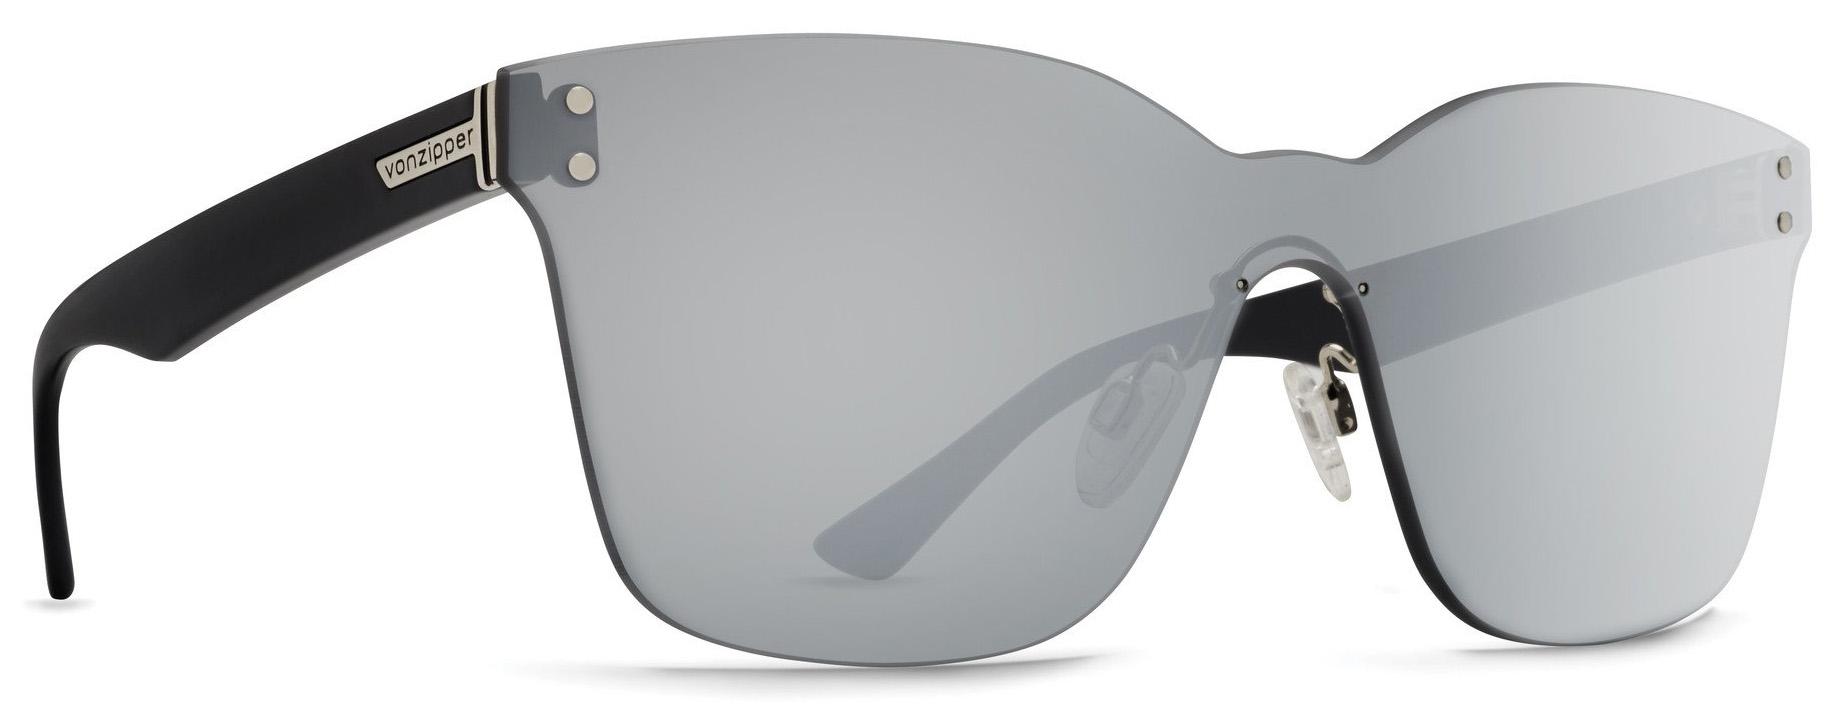 Von Zipper Howl ALT Flash Chrome Silver Lens Sunglasses, Black Gloss